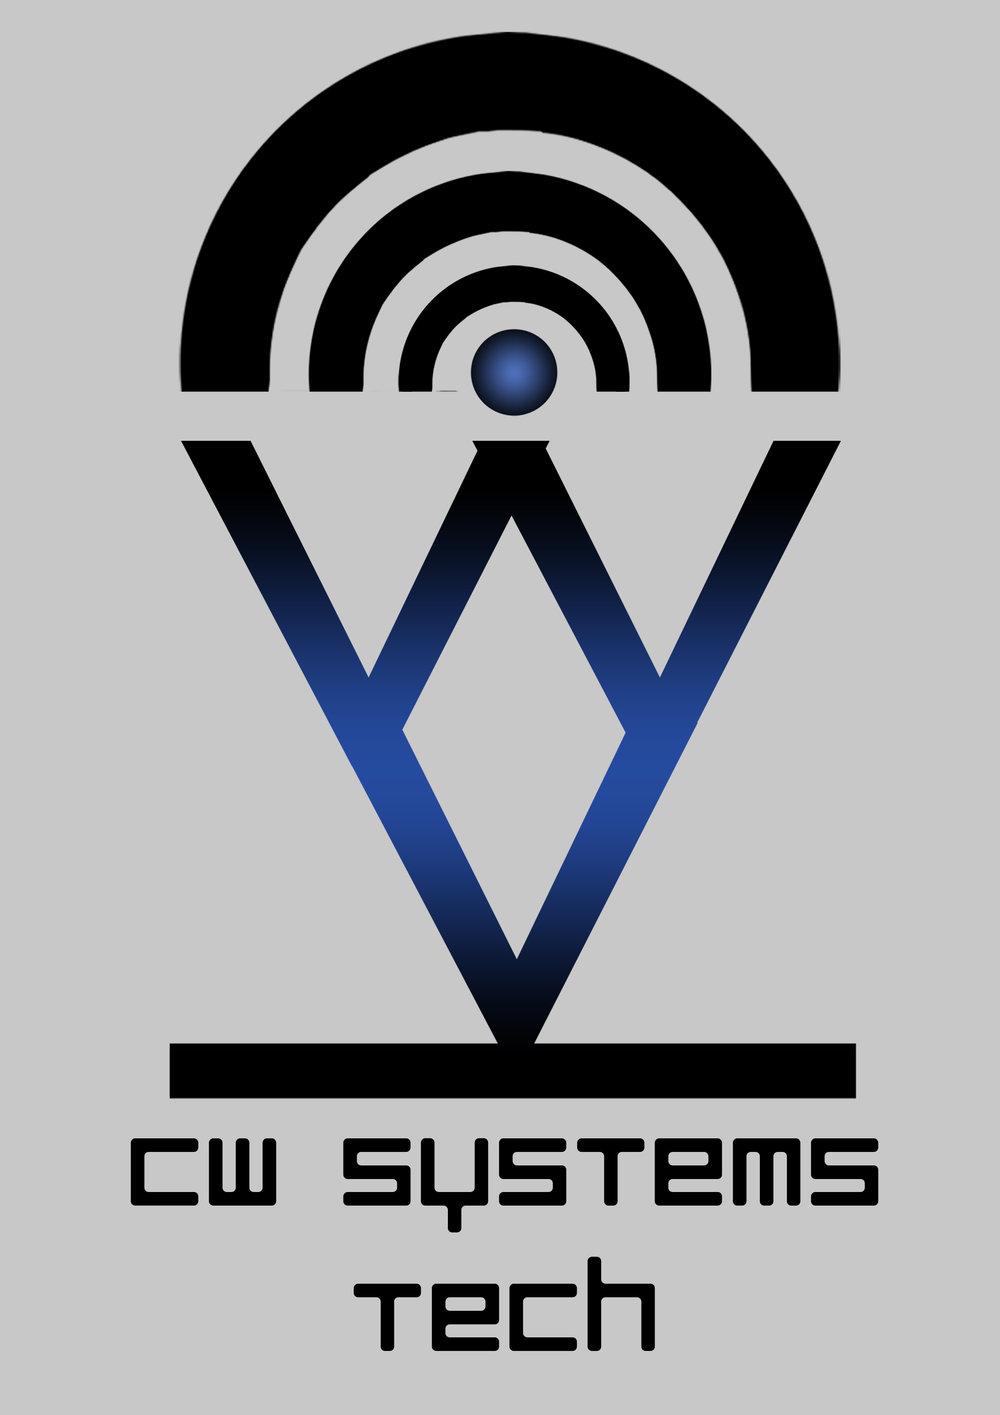 CW Systems Tech logo_Resize_Greyscale.jpg